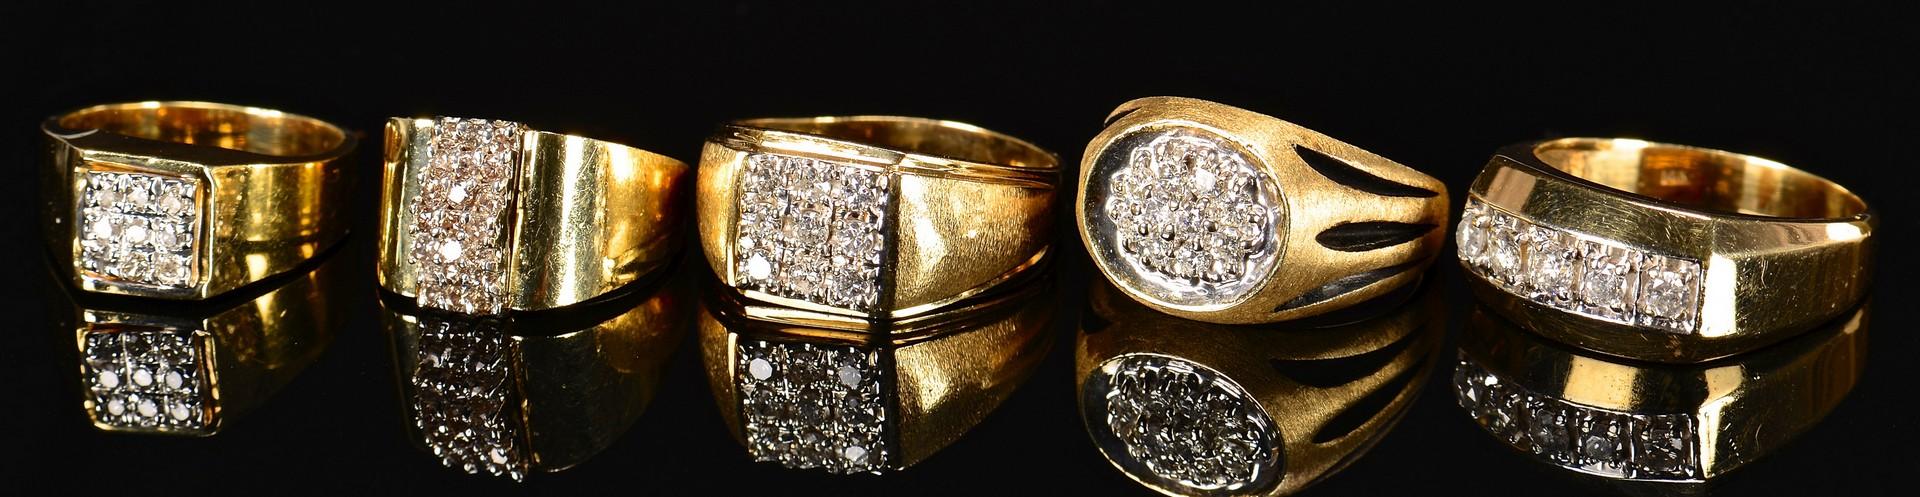 Lot 592: 5 Men's diamond fashion rings